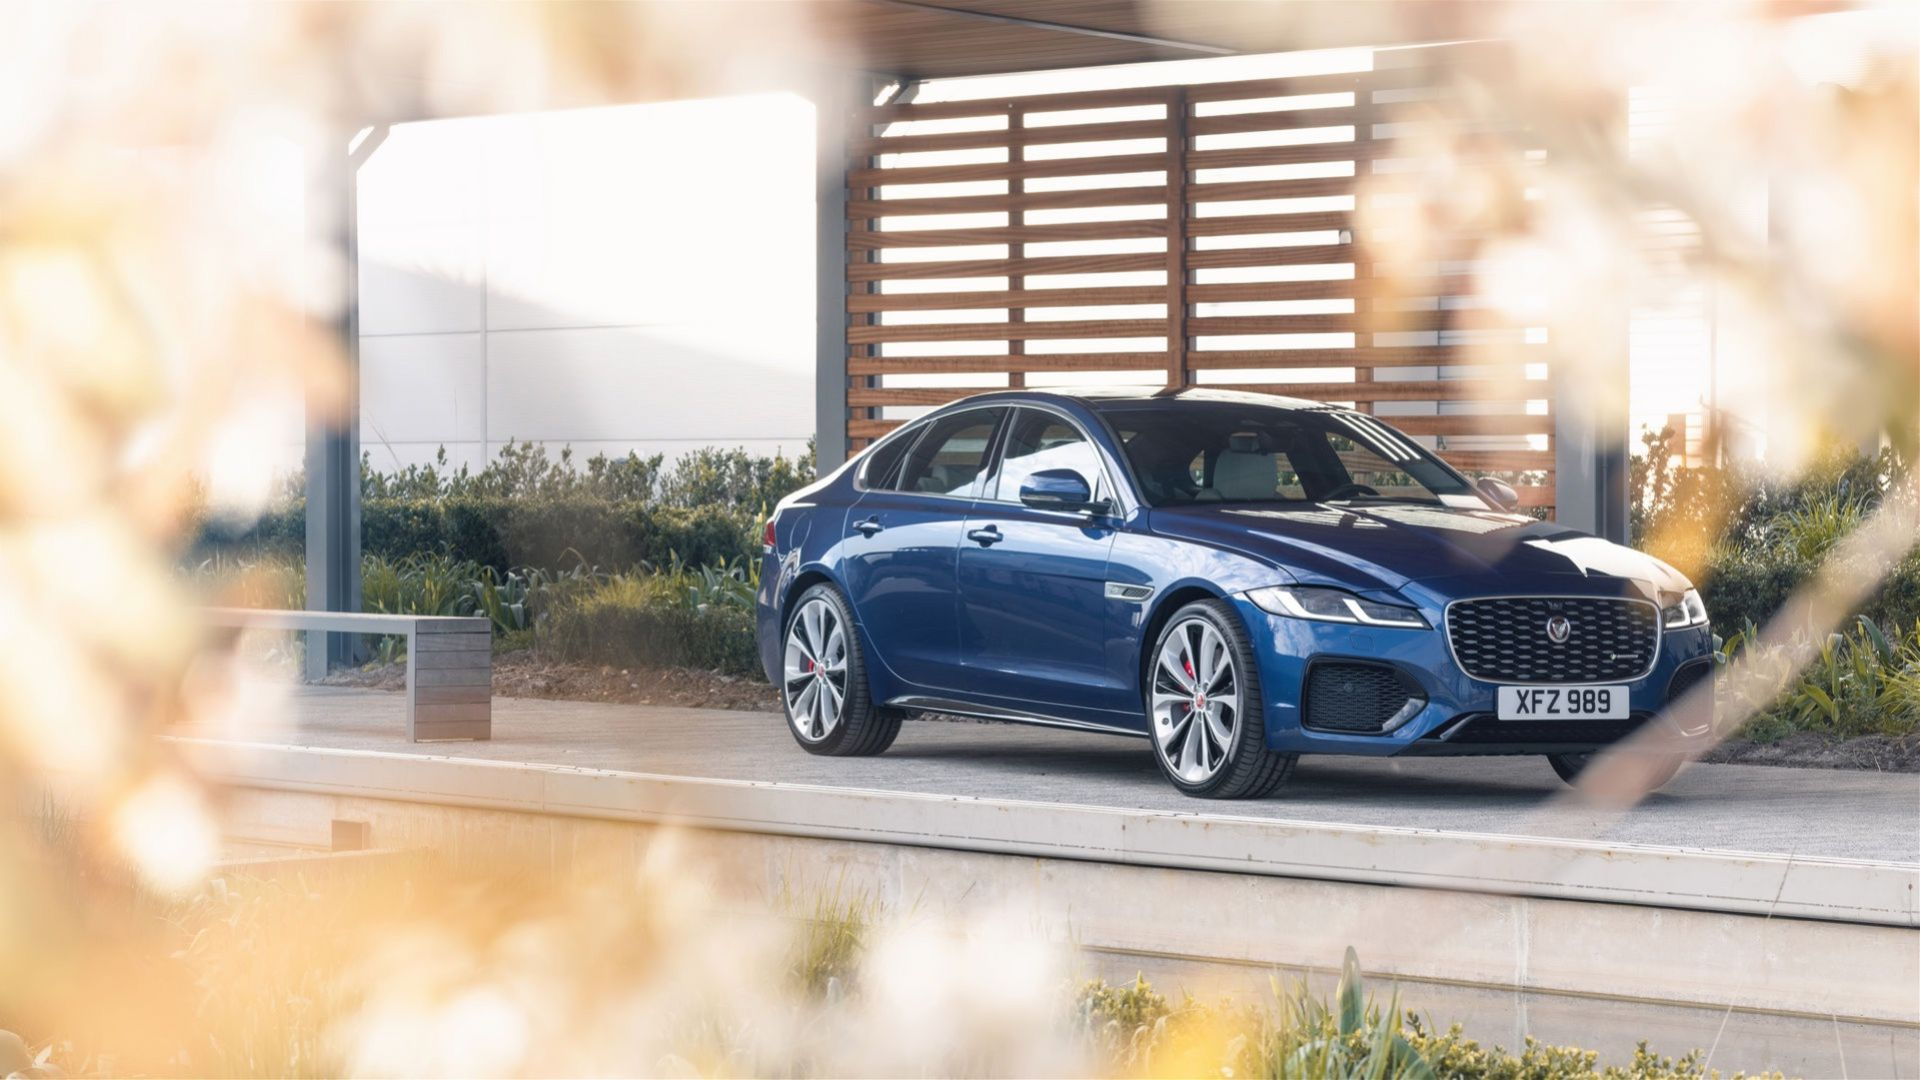 Jaguar lyfter XF